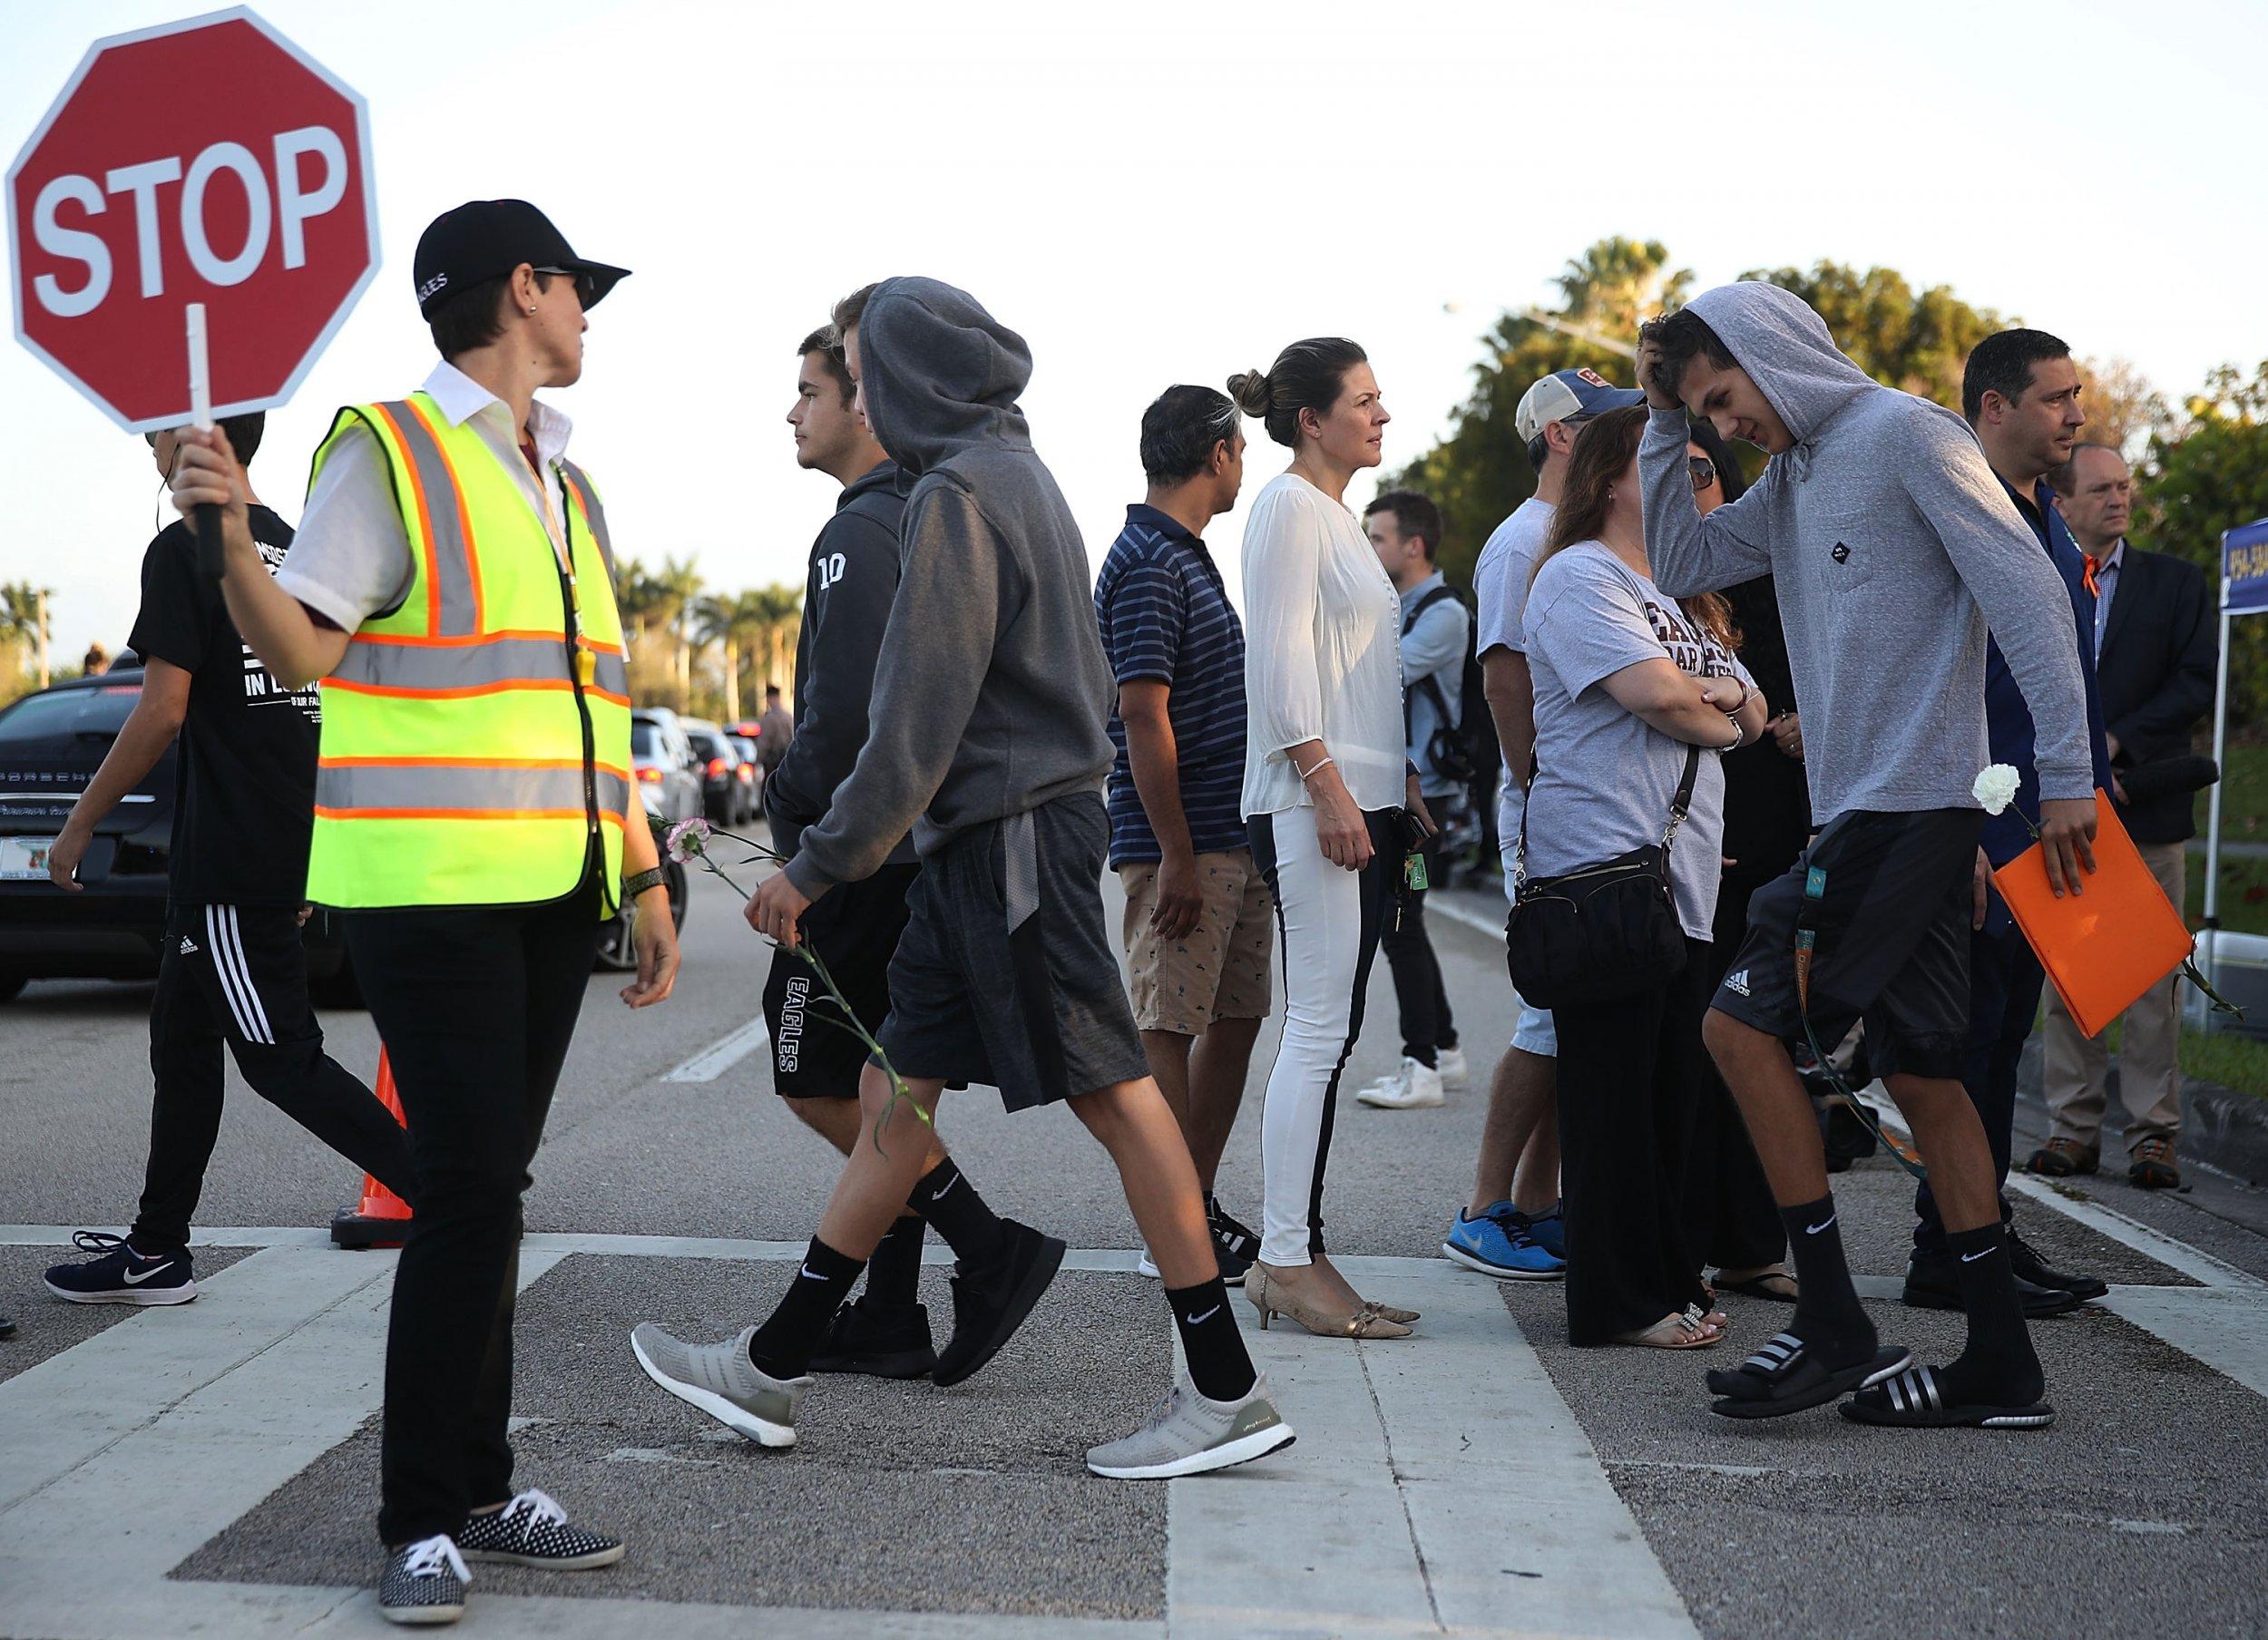 parkland students return to school